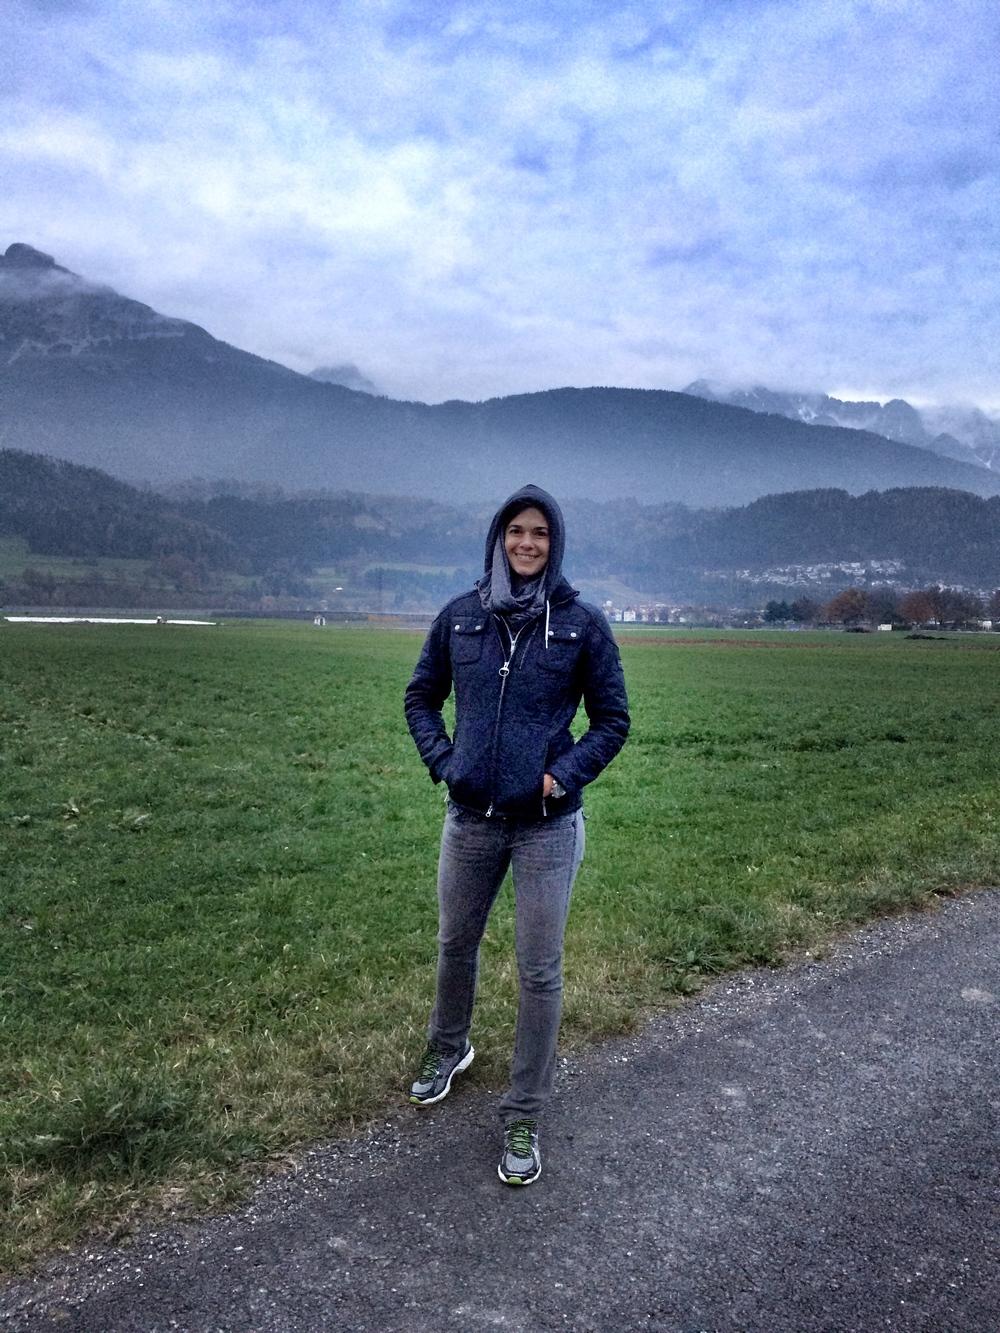 LaurenSchwaiger-Blog-Travel-Wattens-Austria.jpg